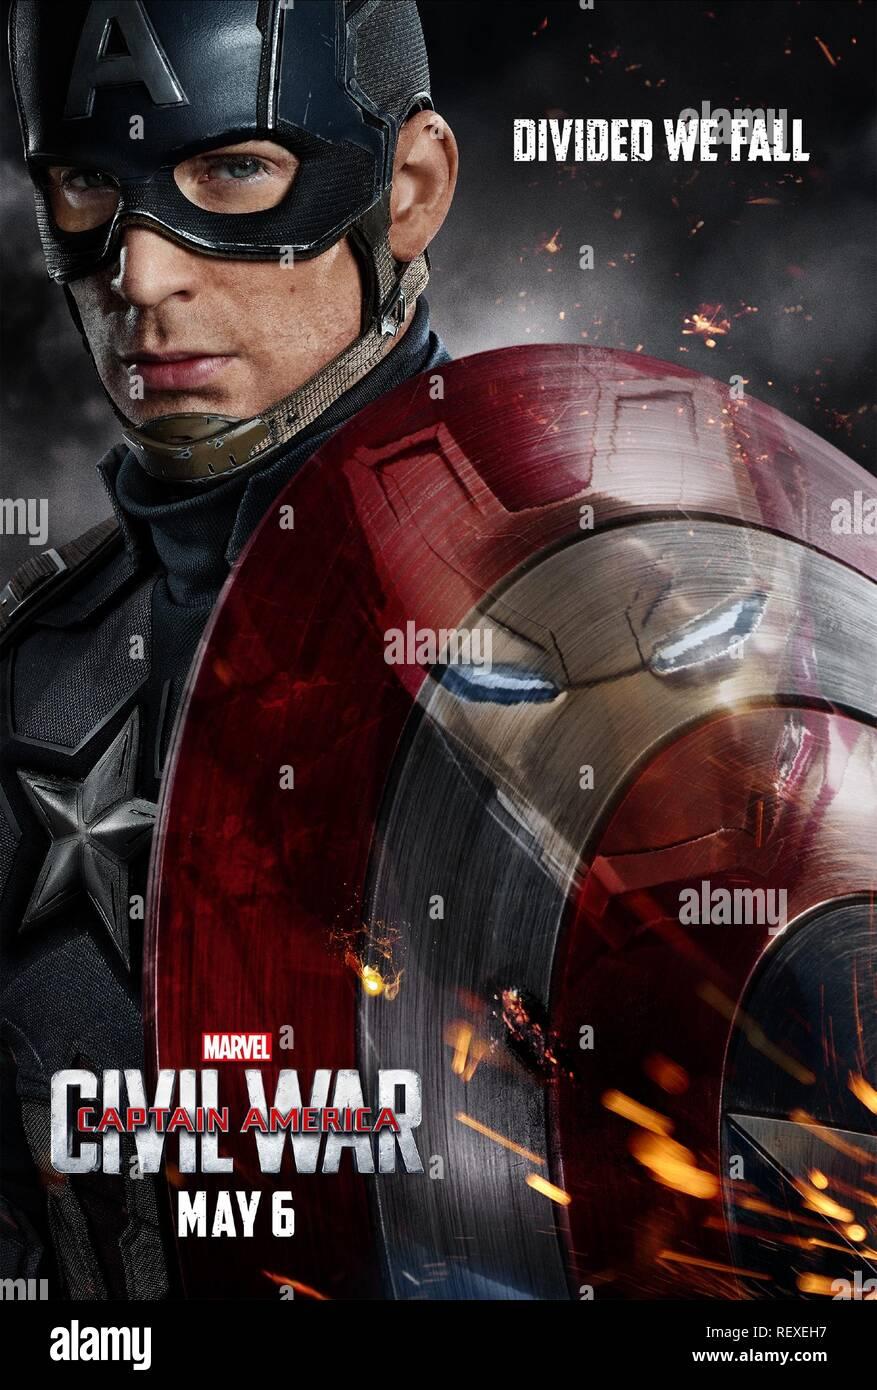 Chris Evans Poster Captain America Civil War 2016 Stock Photo Alamy